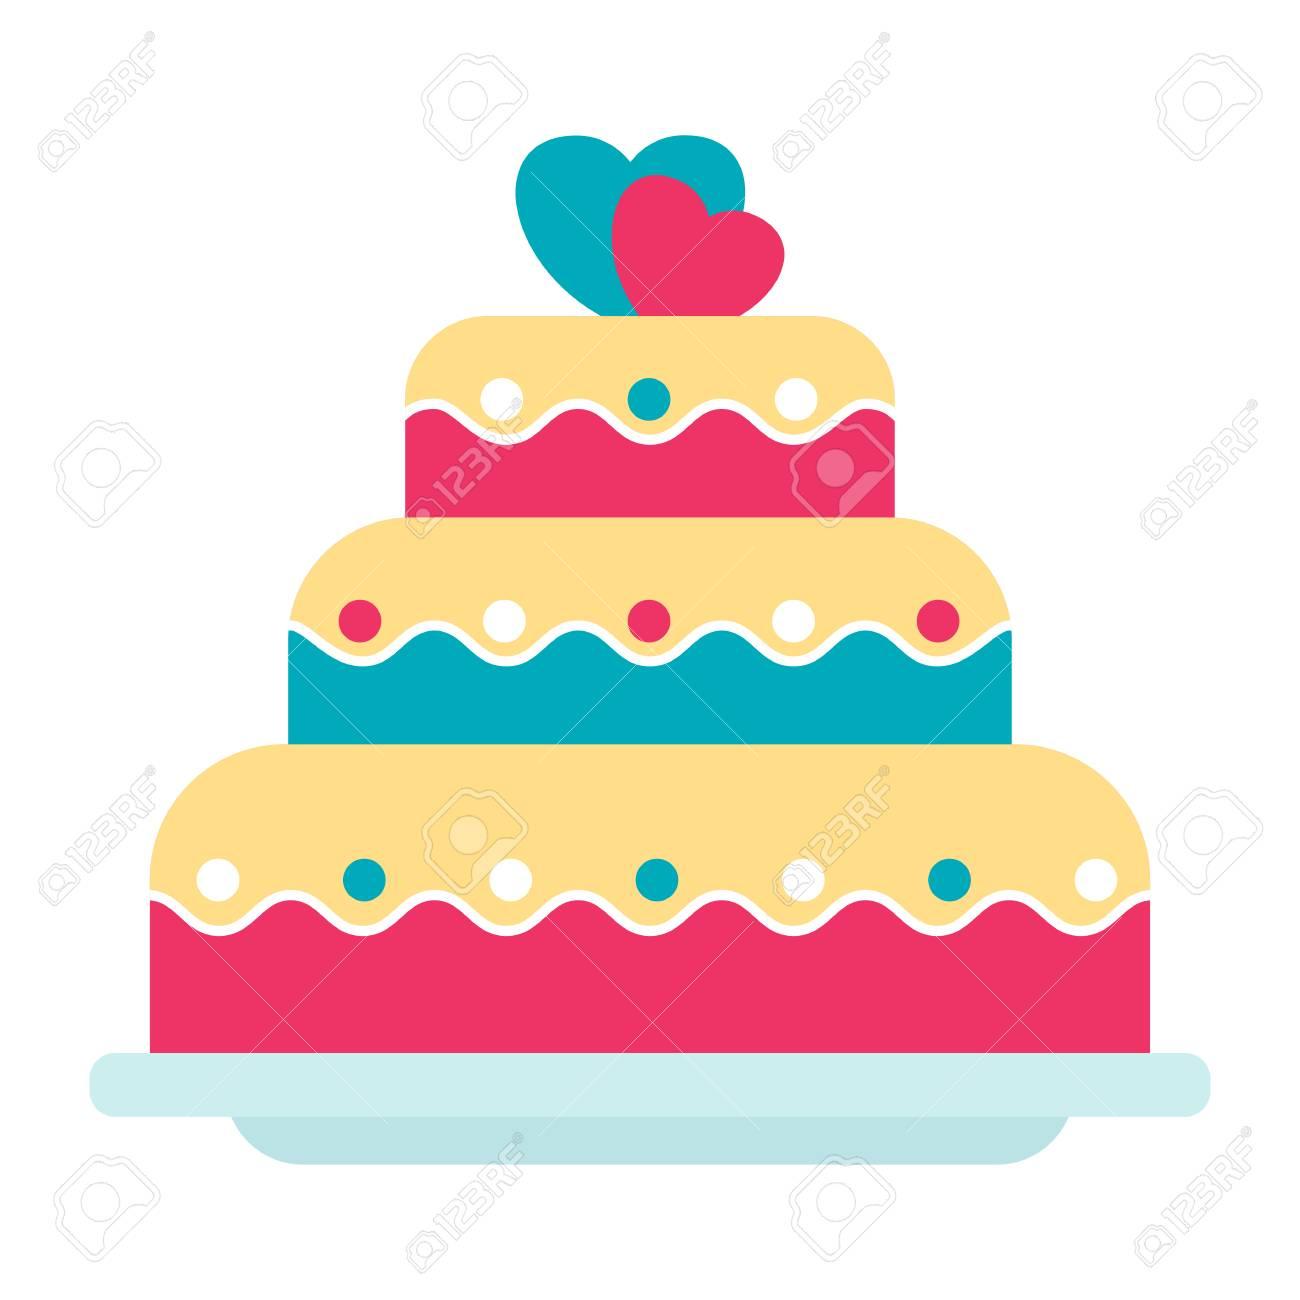 Flat Vector Festive Wedding Cake Illustration. Objects Isolated ...